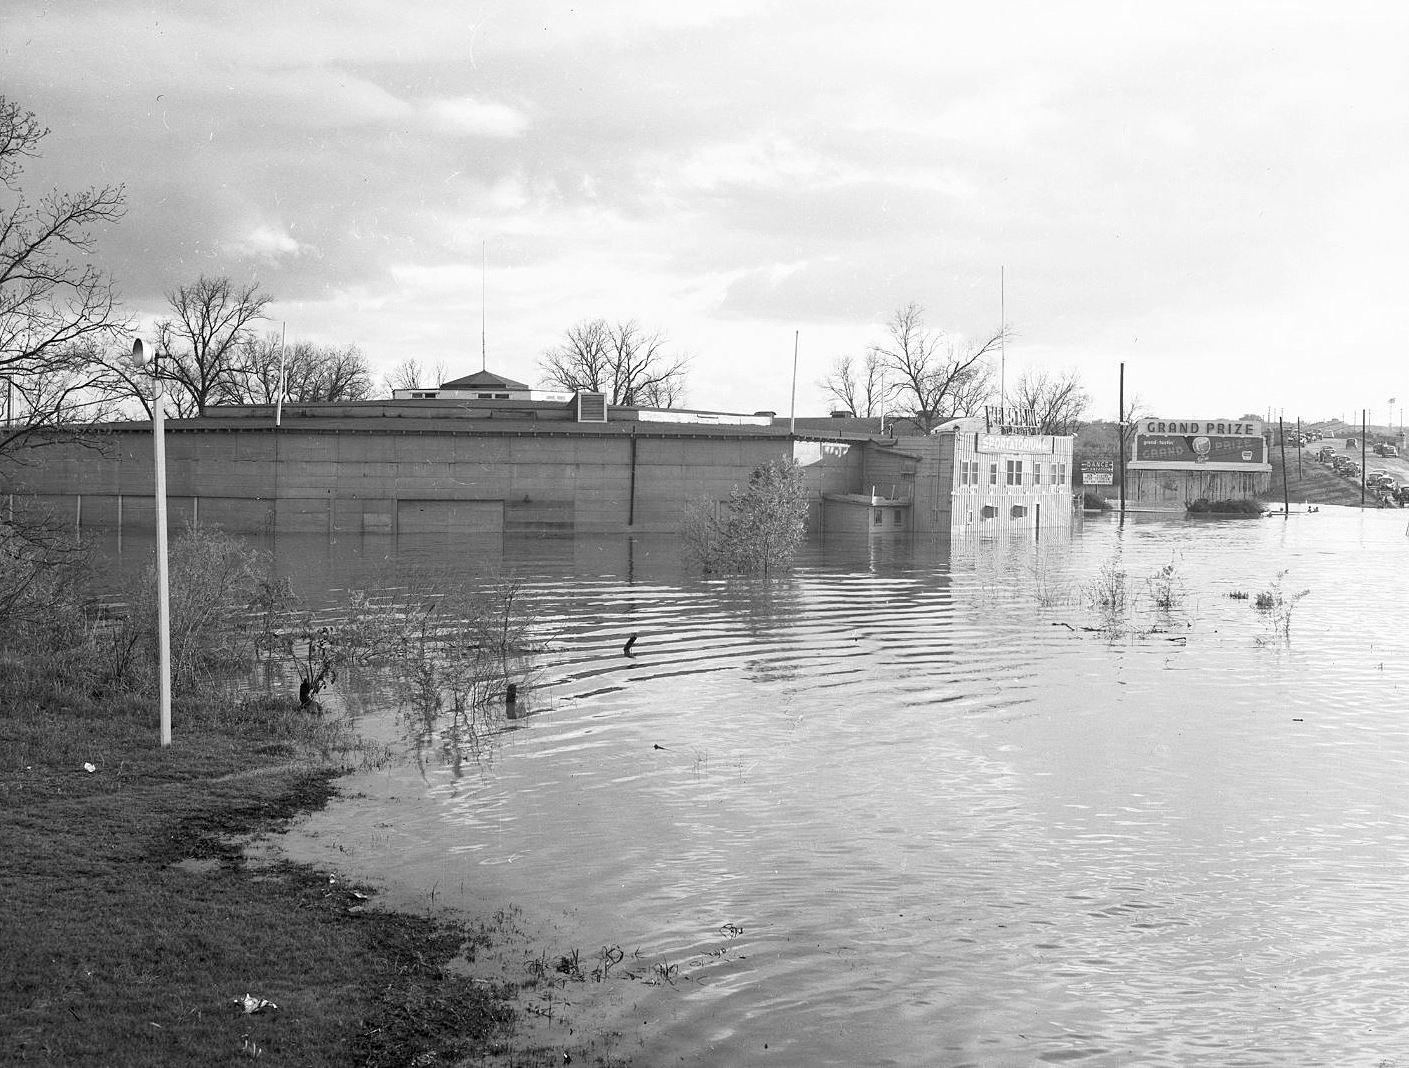 sportatorium_flood_squire-haskins_UTA_no-boys